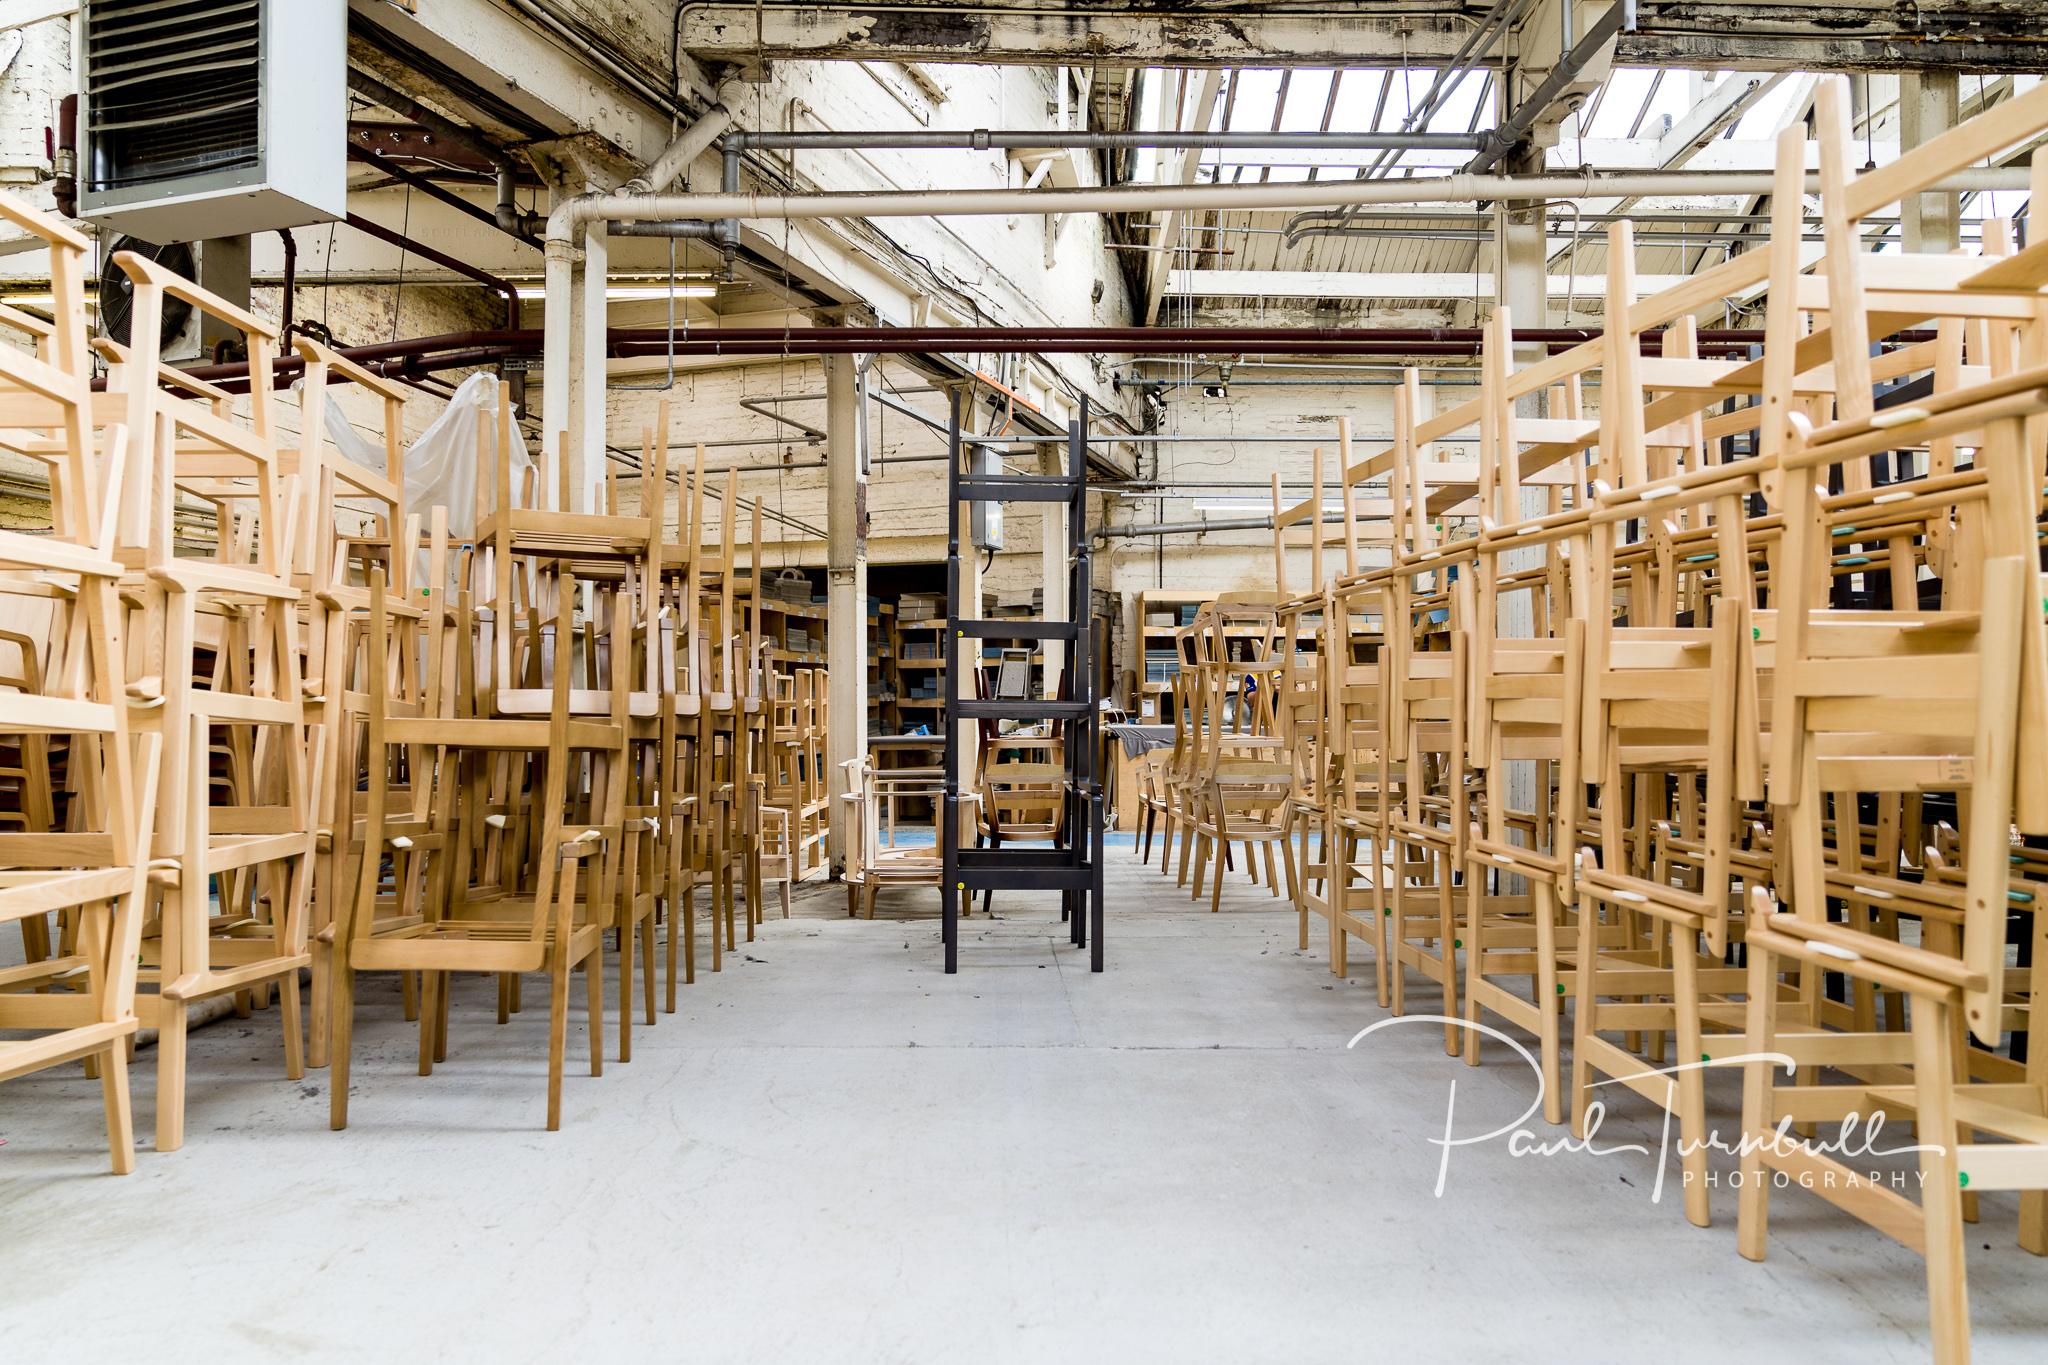 commercial-photographer-leeds-bradford-knightsbridge-furniture-tour-038.jpg